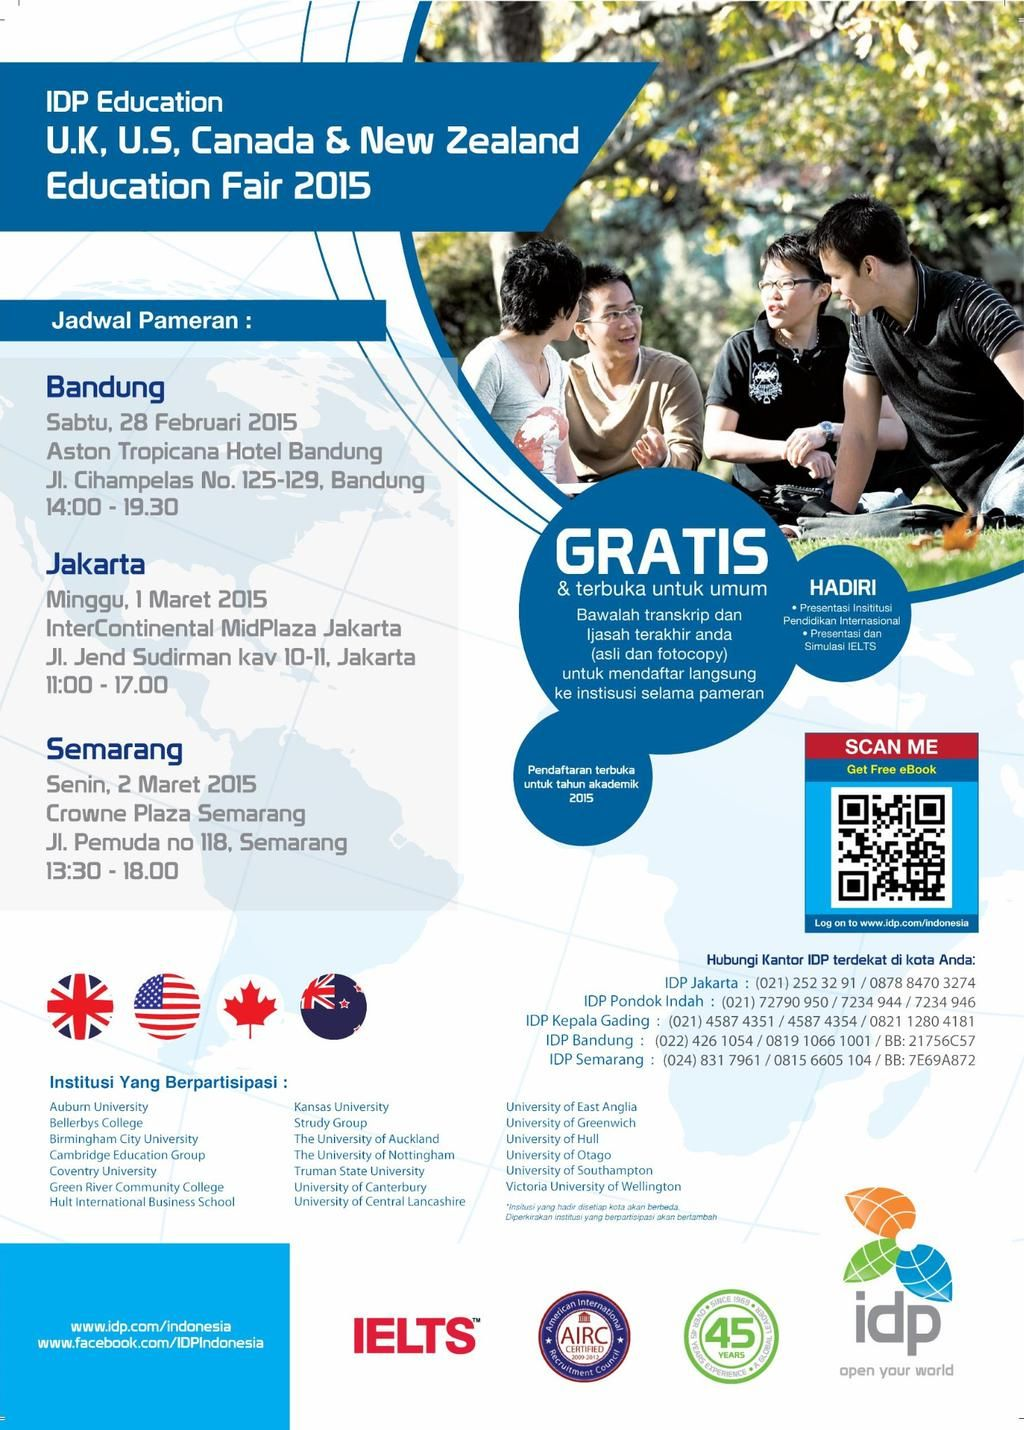 Pin by IDP Education Ltd (BandungIndonesia) on Study in